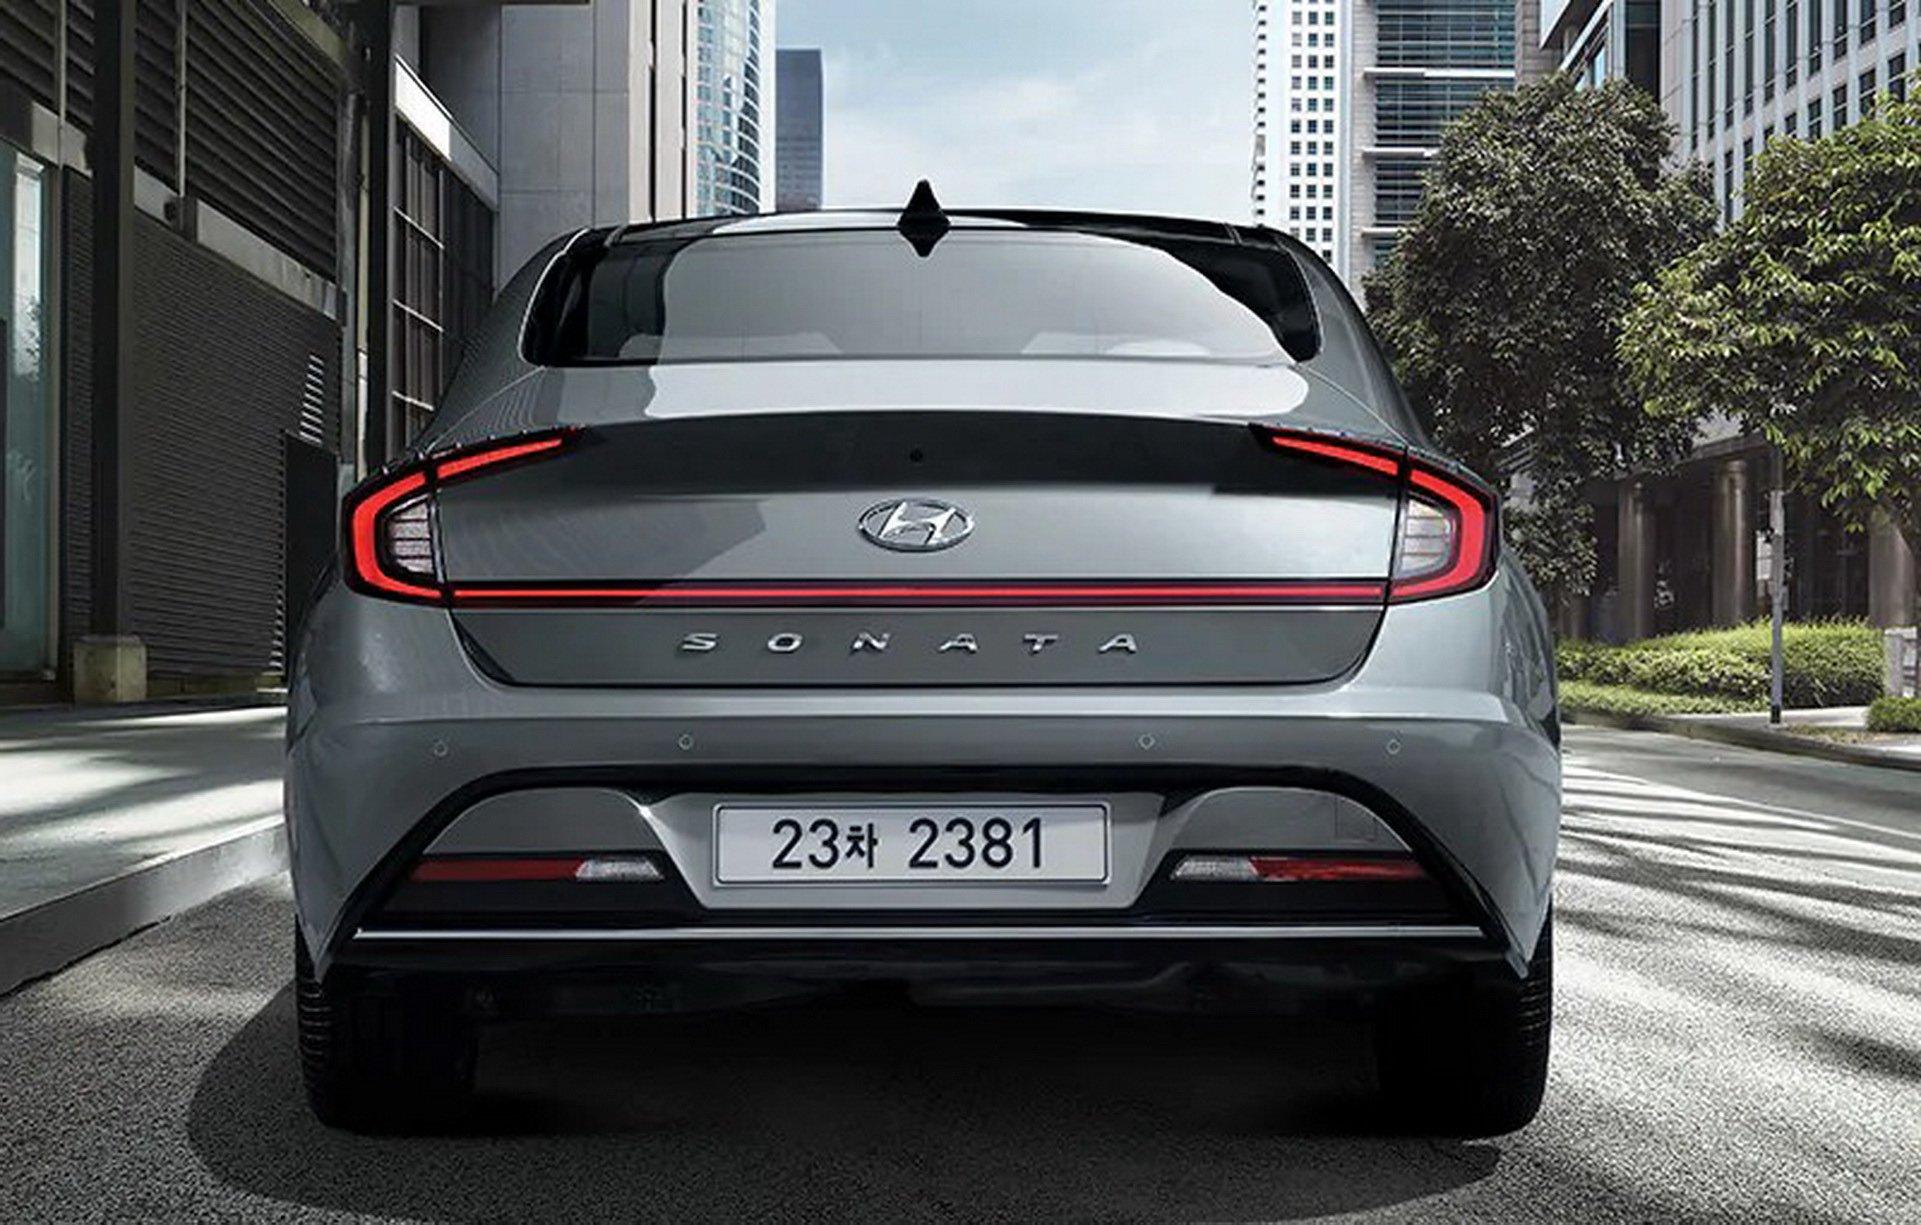 Build A Honda >> 2020 Hyundai Sonata Is Sharper, Plusher, More Technologized Than Ever Before - autoevolution